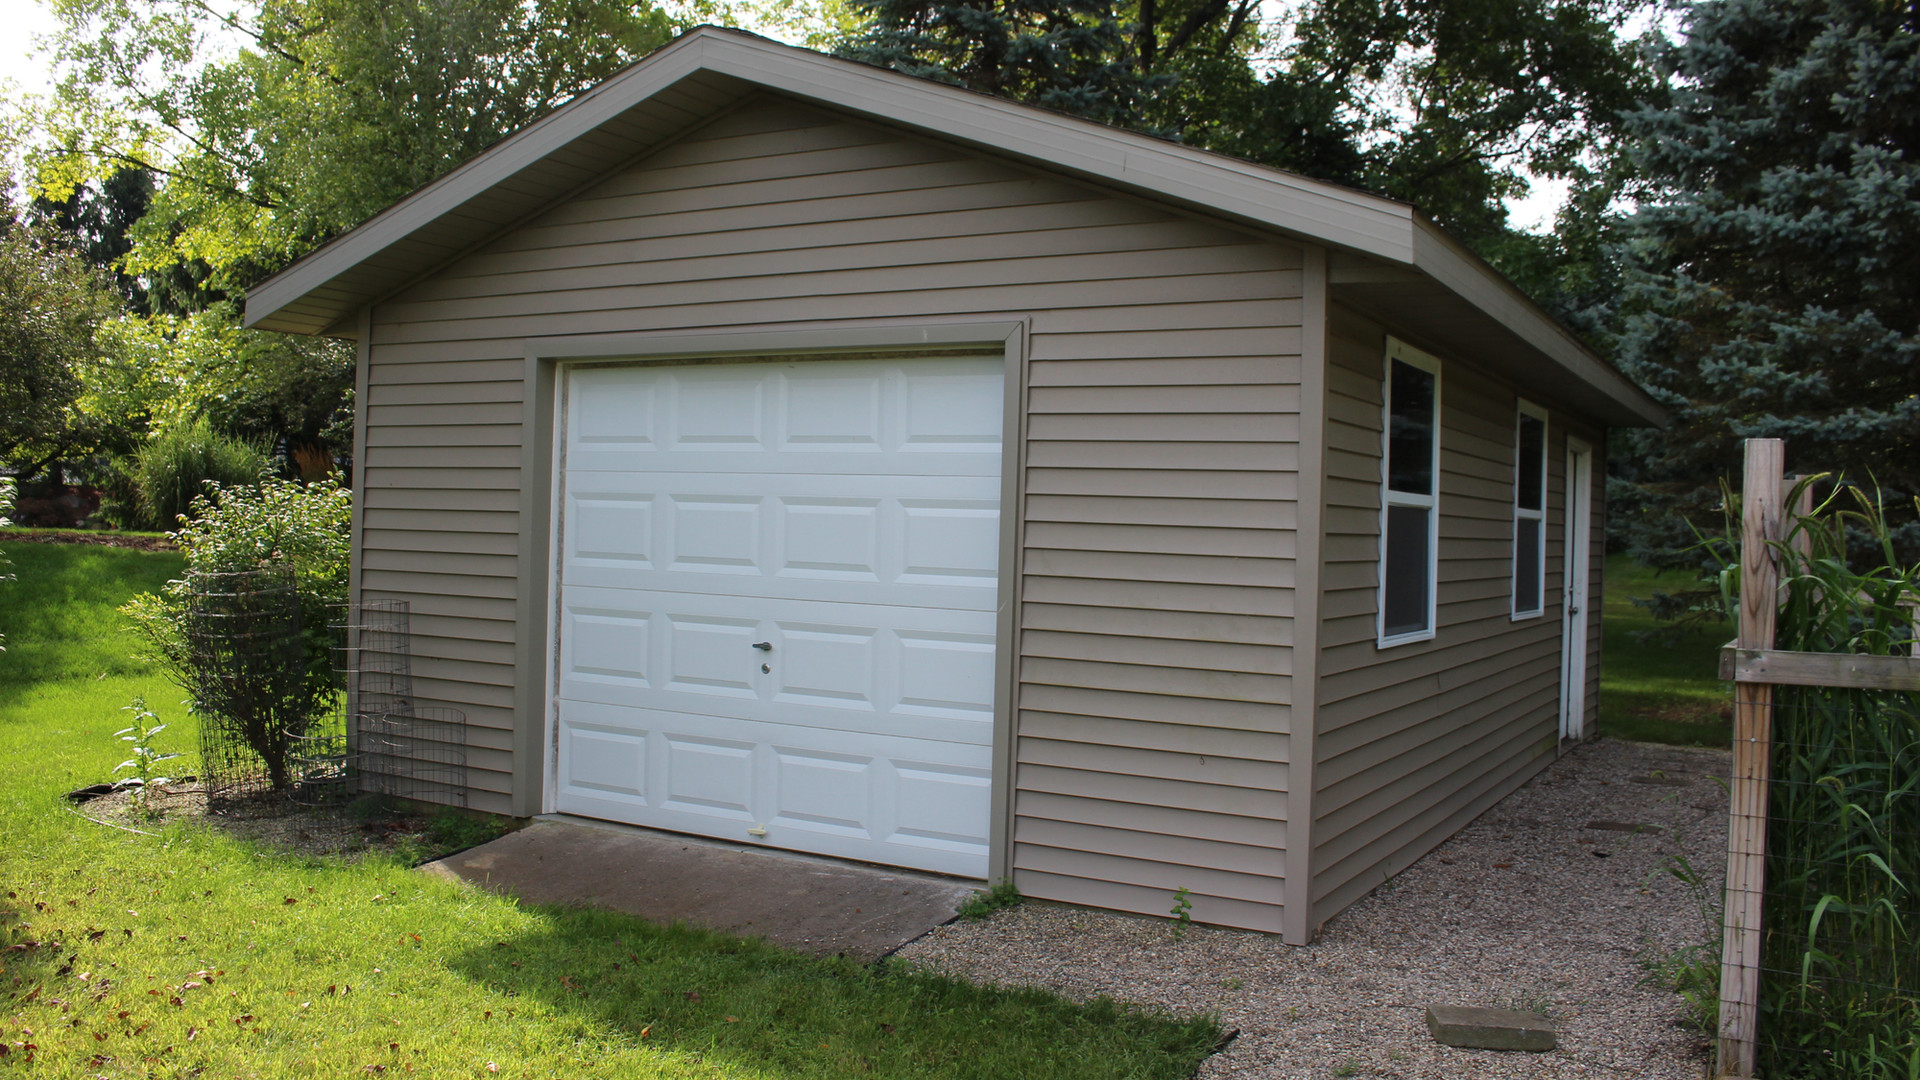 Garage built by EB Companies